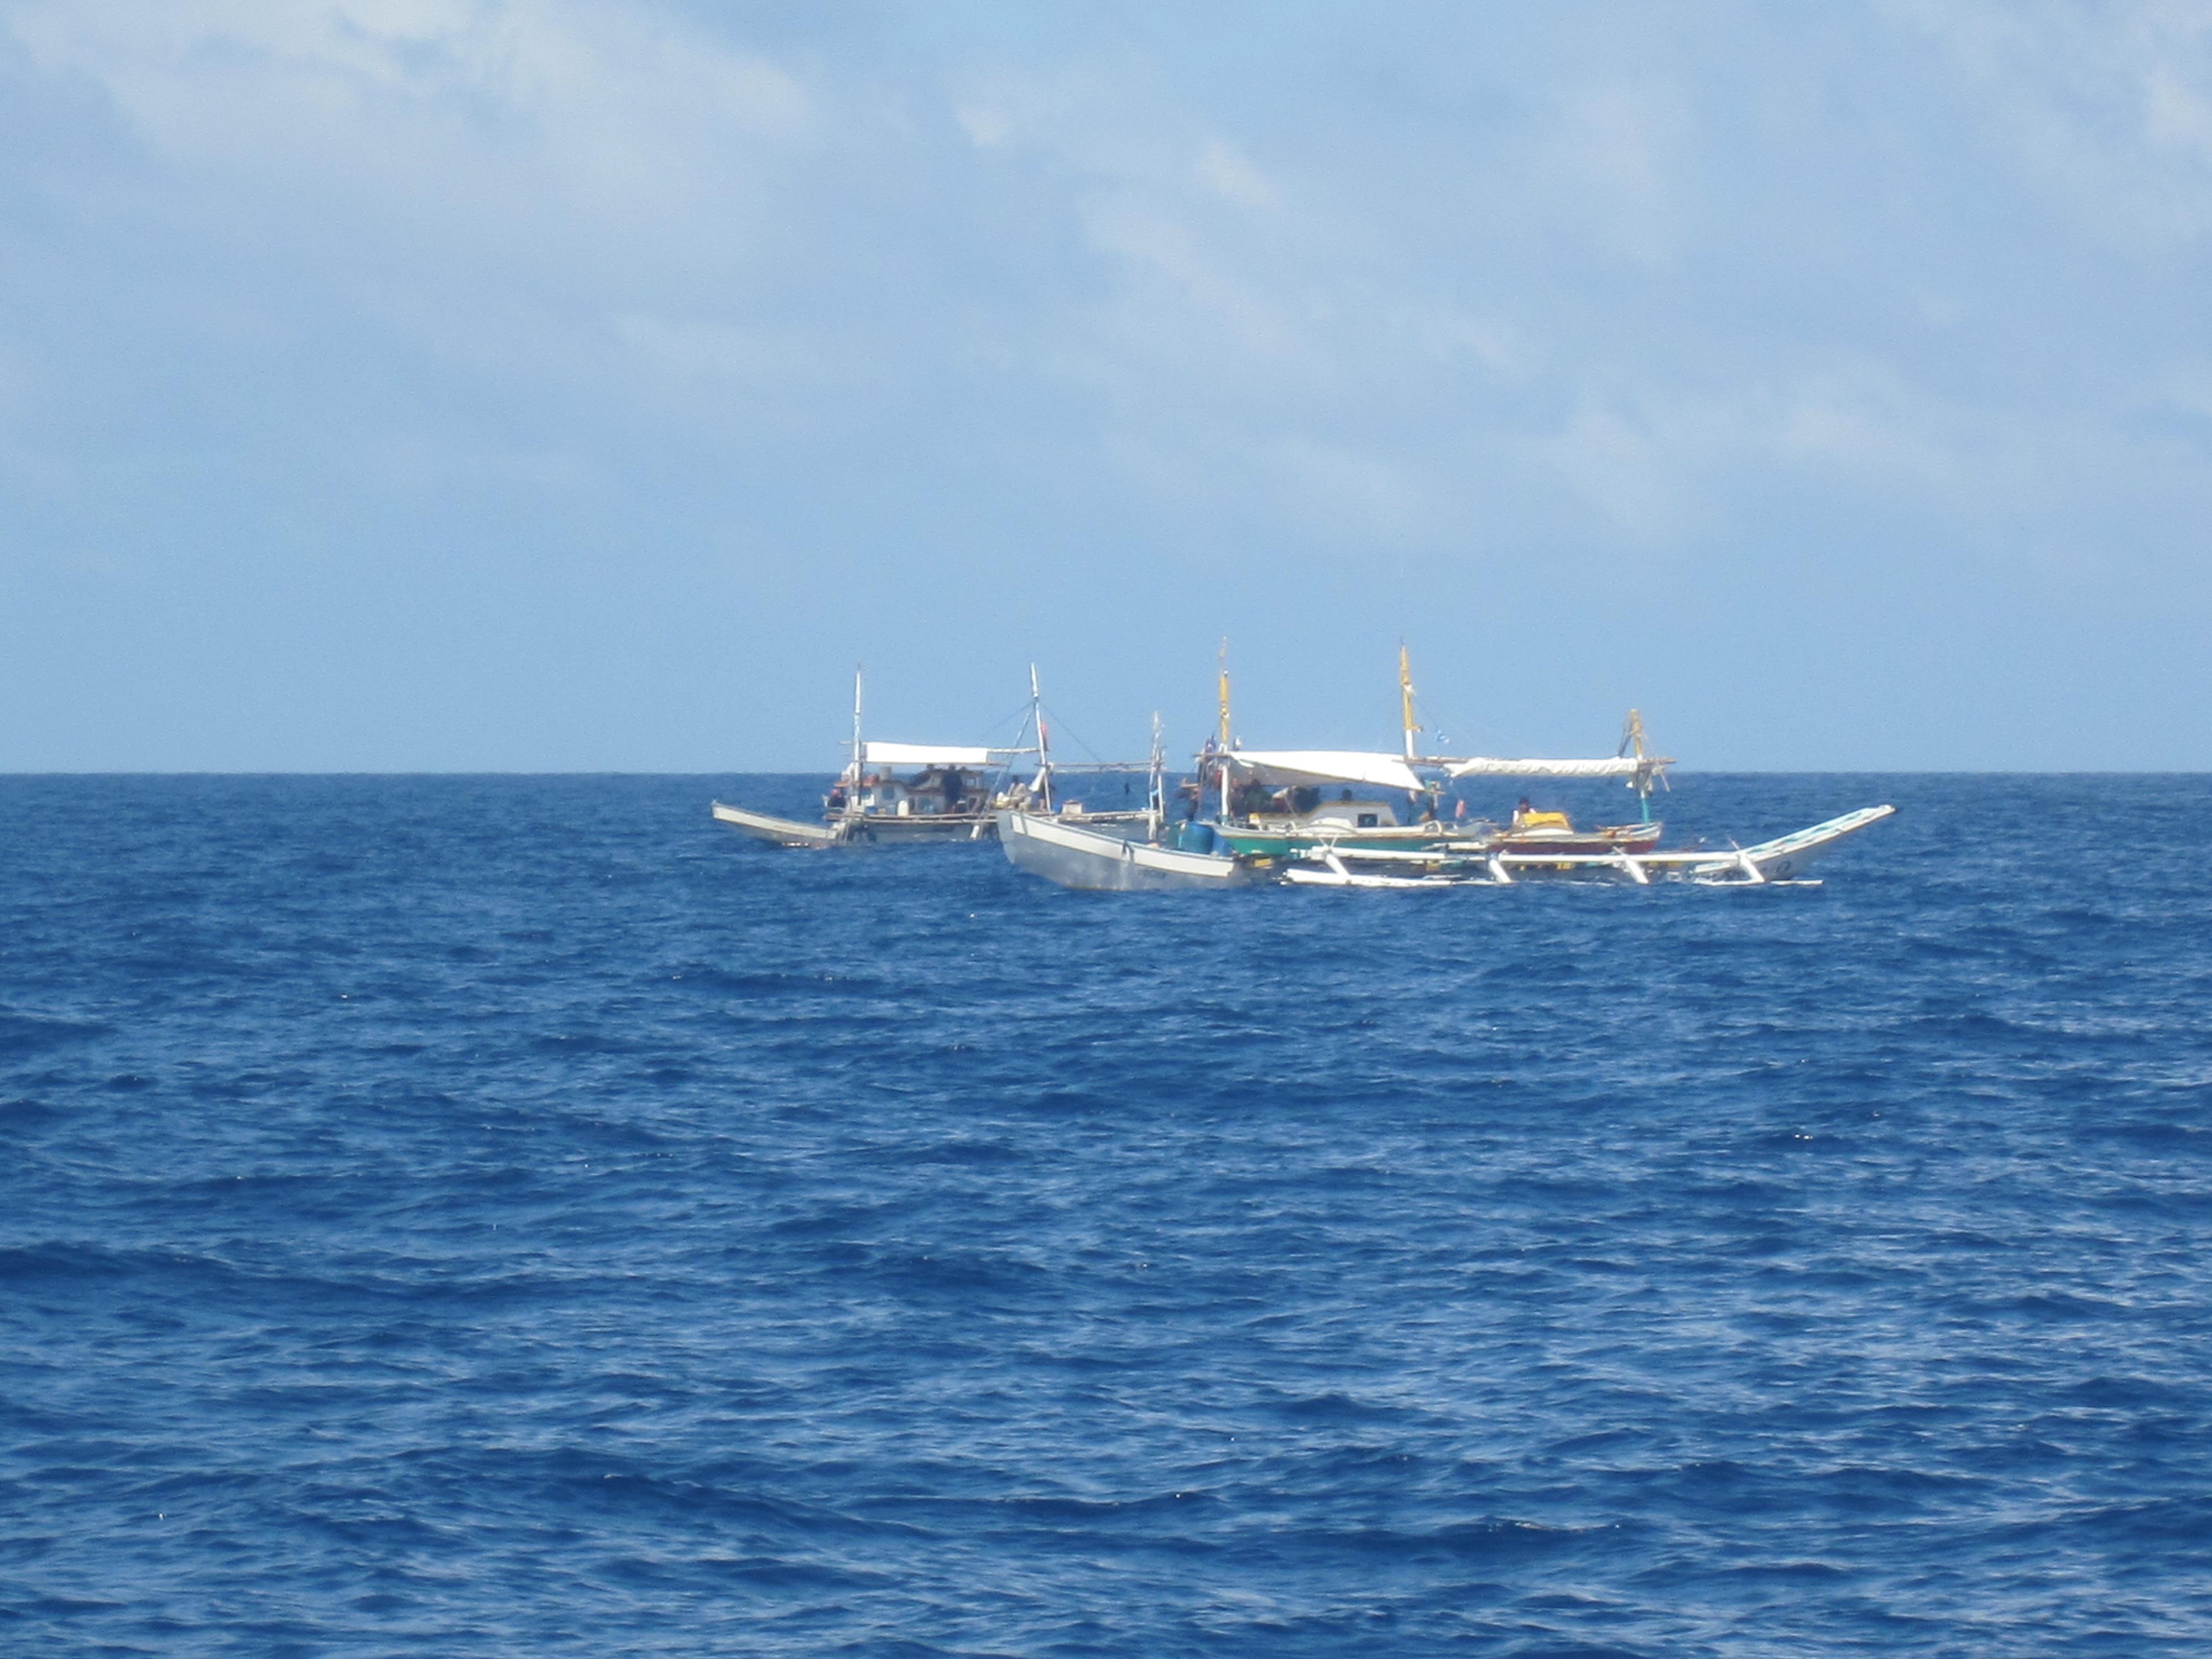 A Philippine fishing vessel